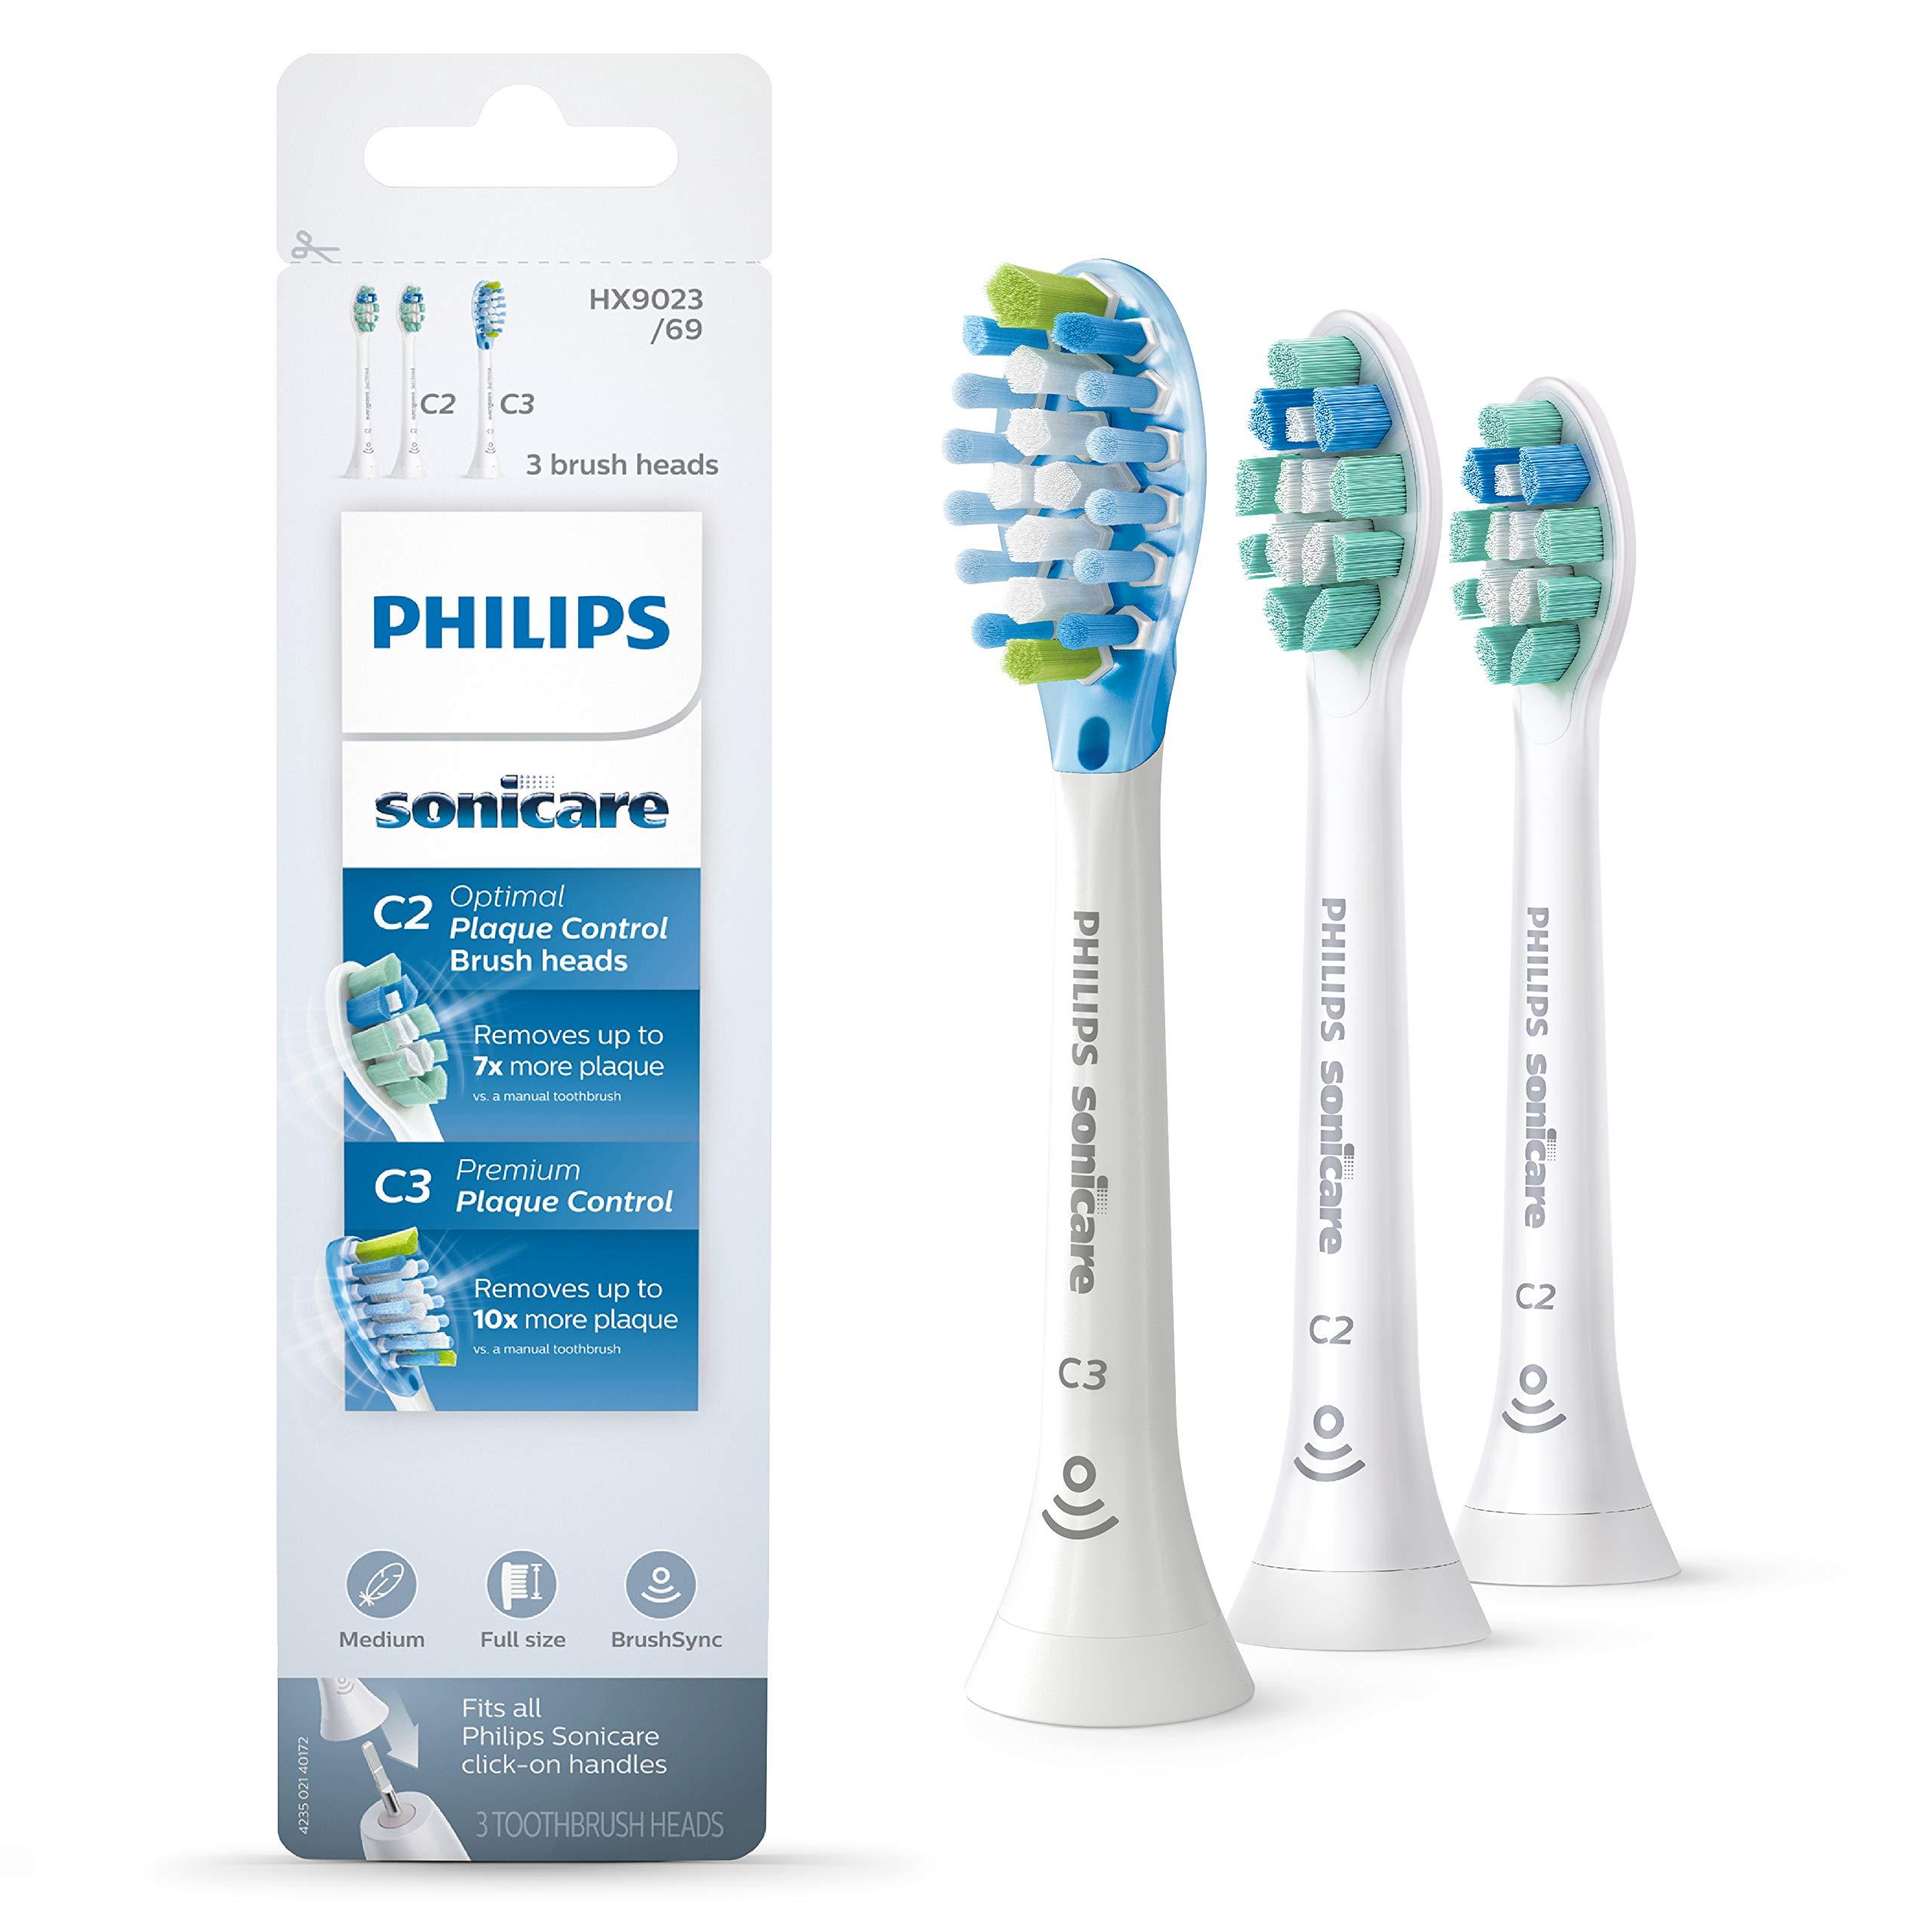 Genuine Philips Sonicare toothbrush head variety pack - C3 Premium Plaque Control & C2 Optimal Plaque Control, HX9023/69, 3-pk, white